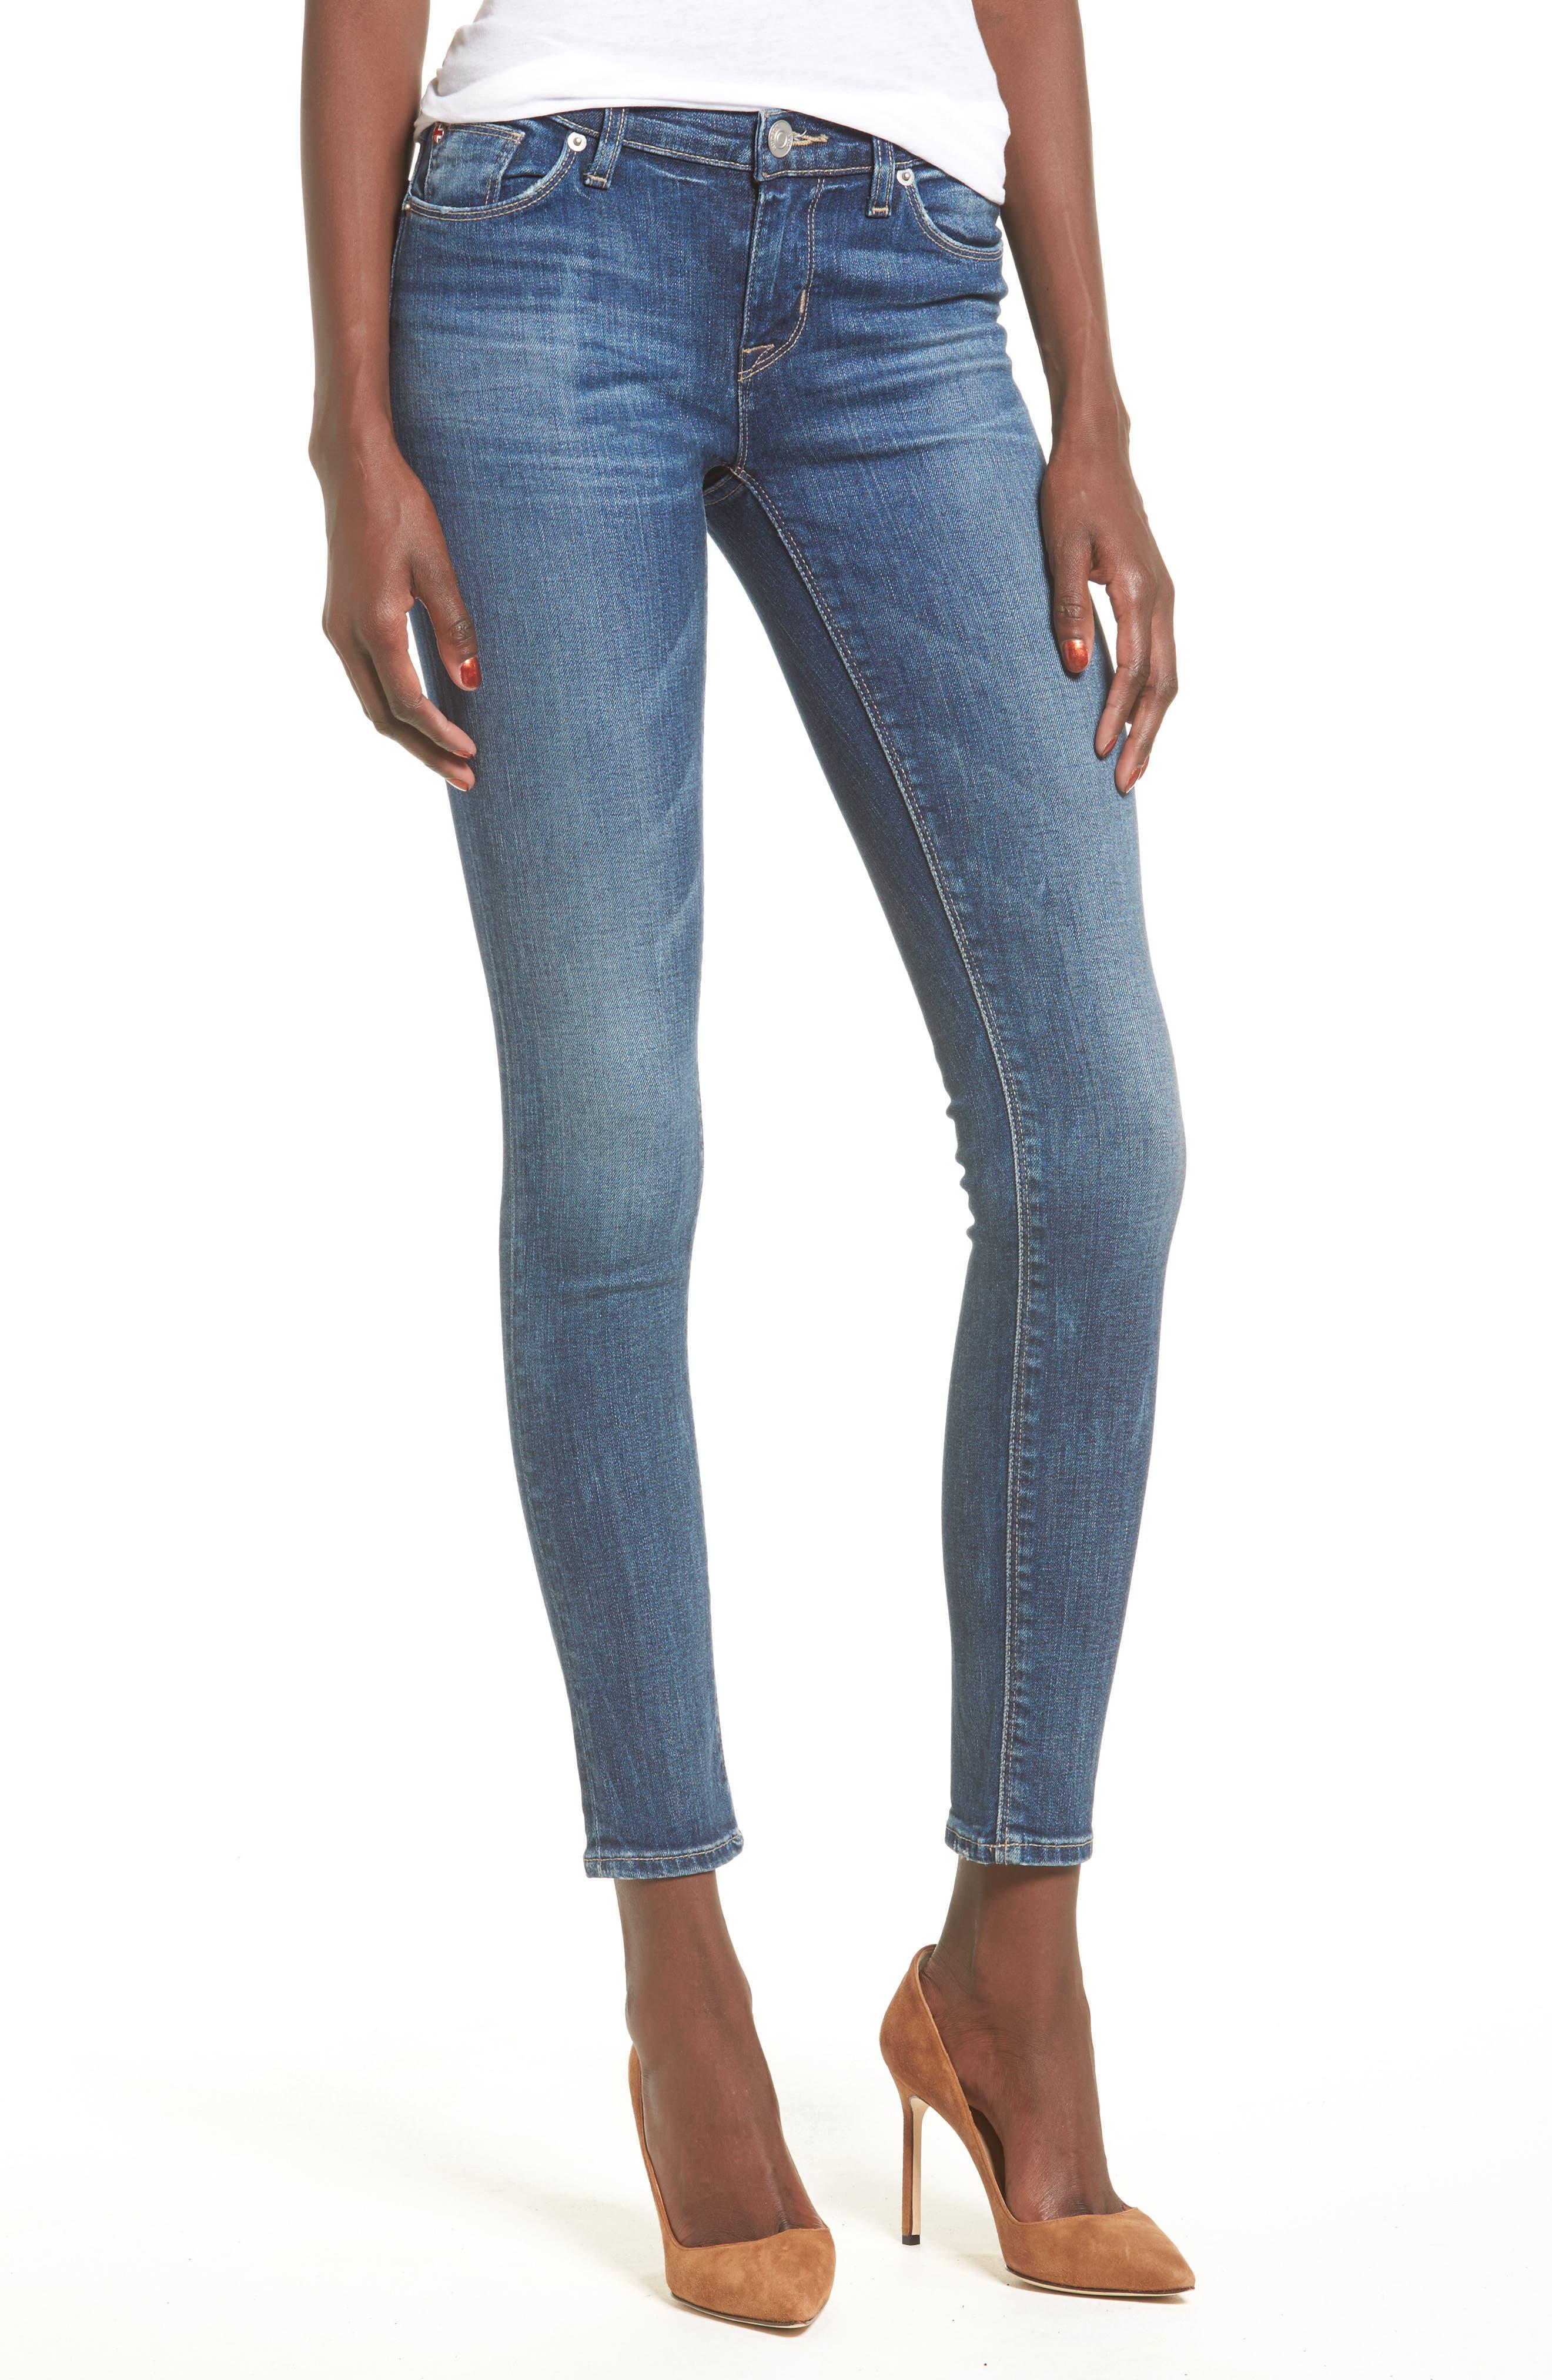 Main Image - Hudson Jeans 'Krista' Super Skinny Jeans (Solo)